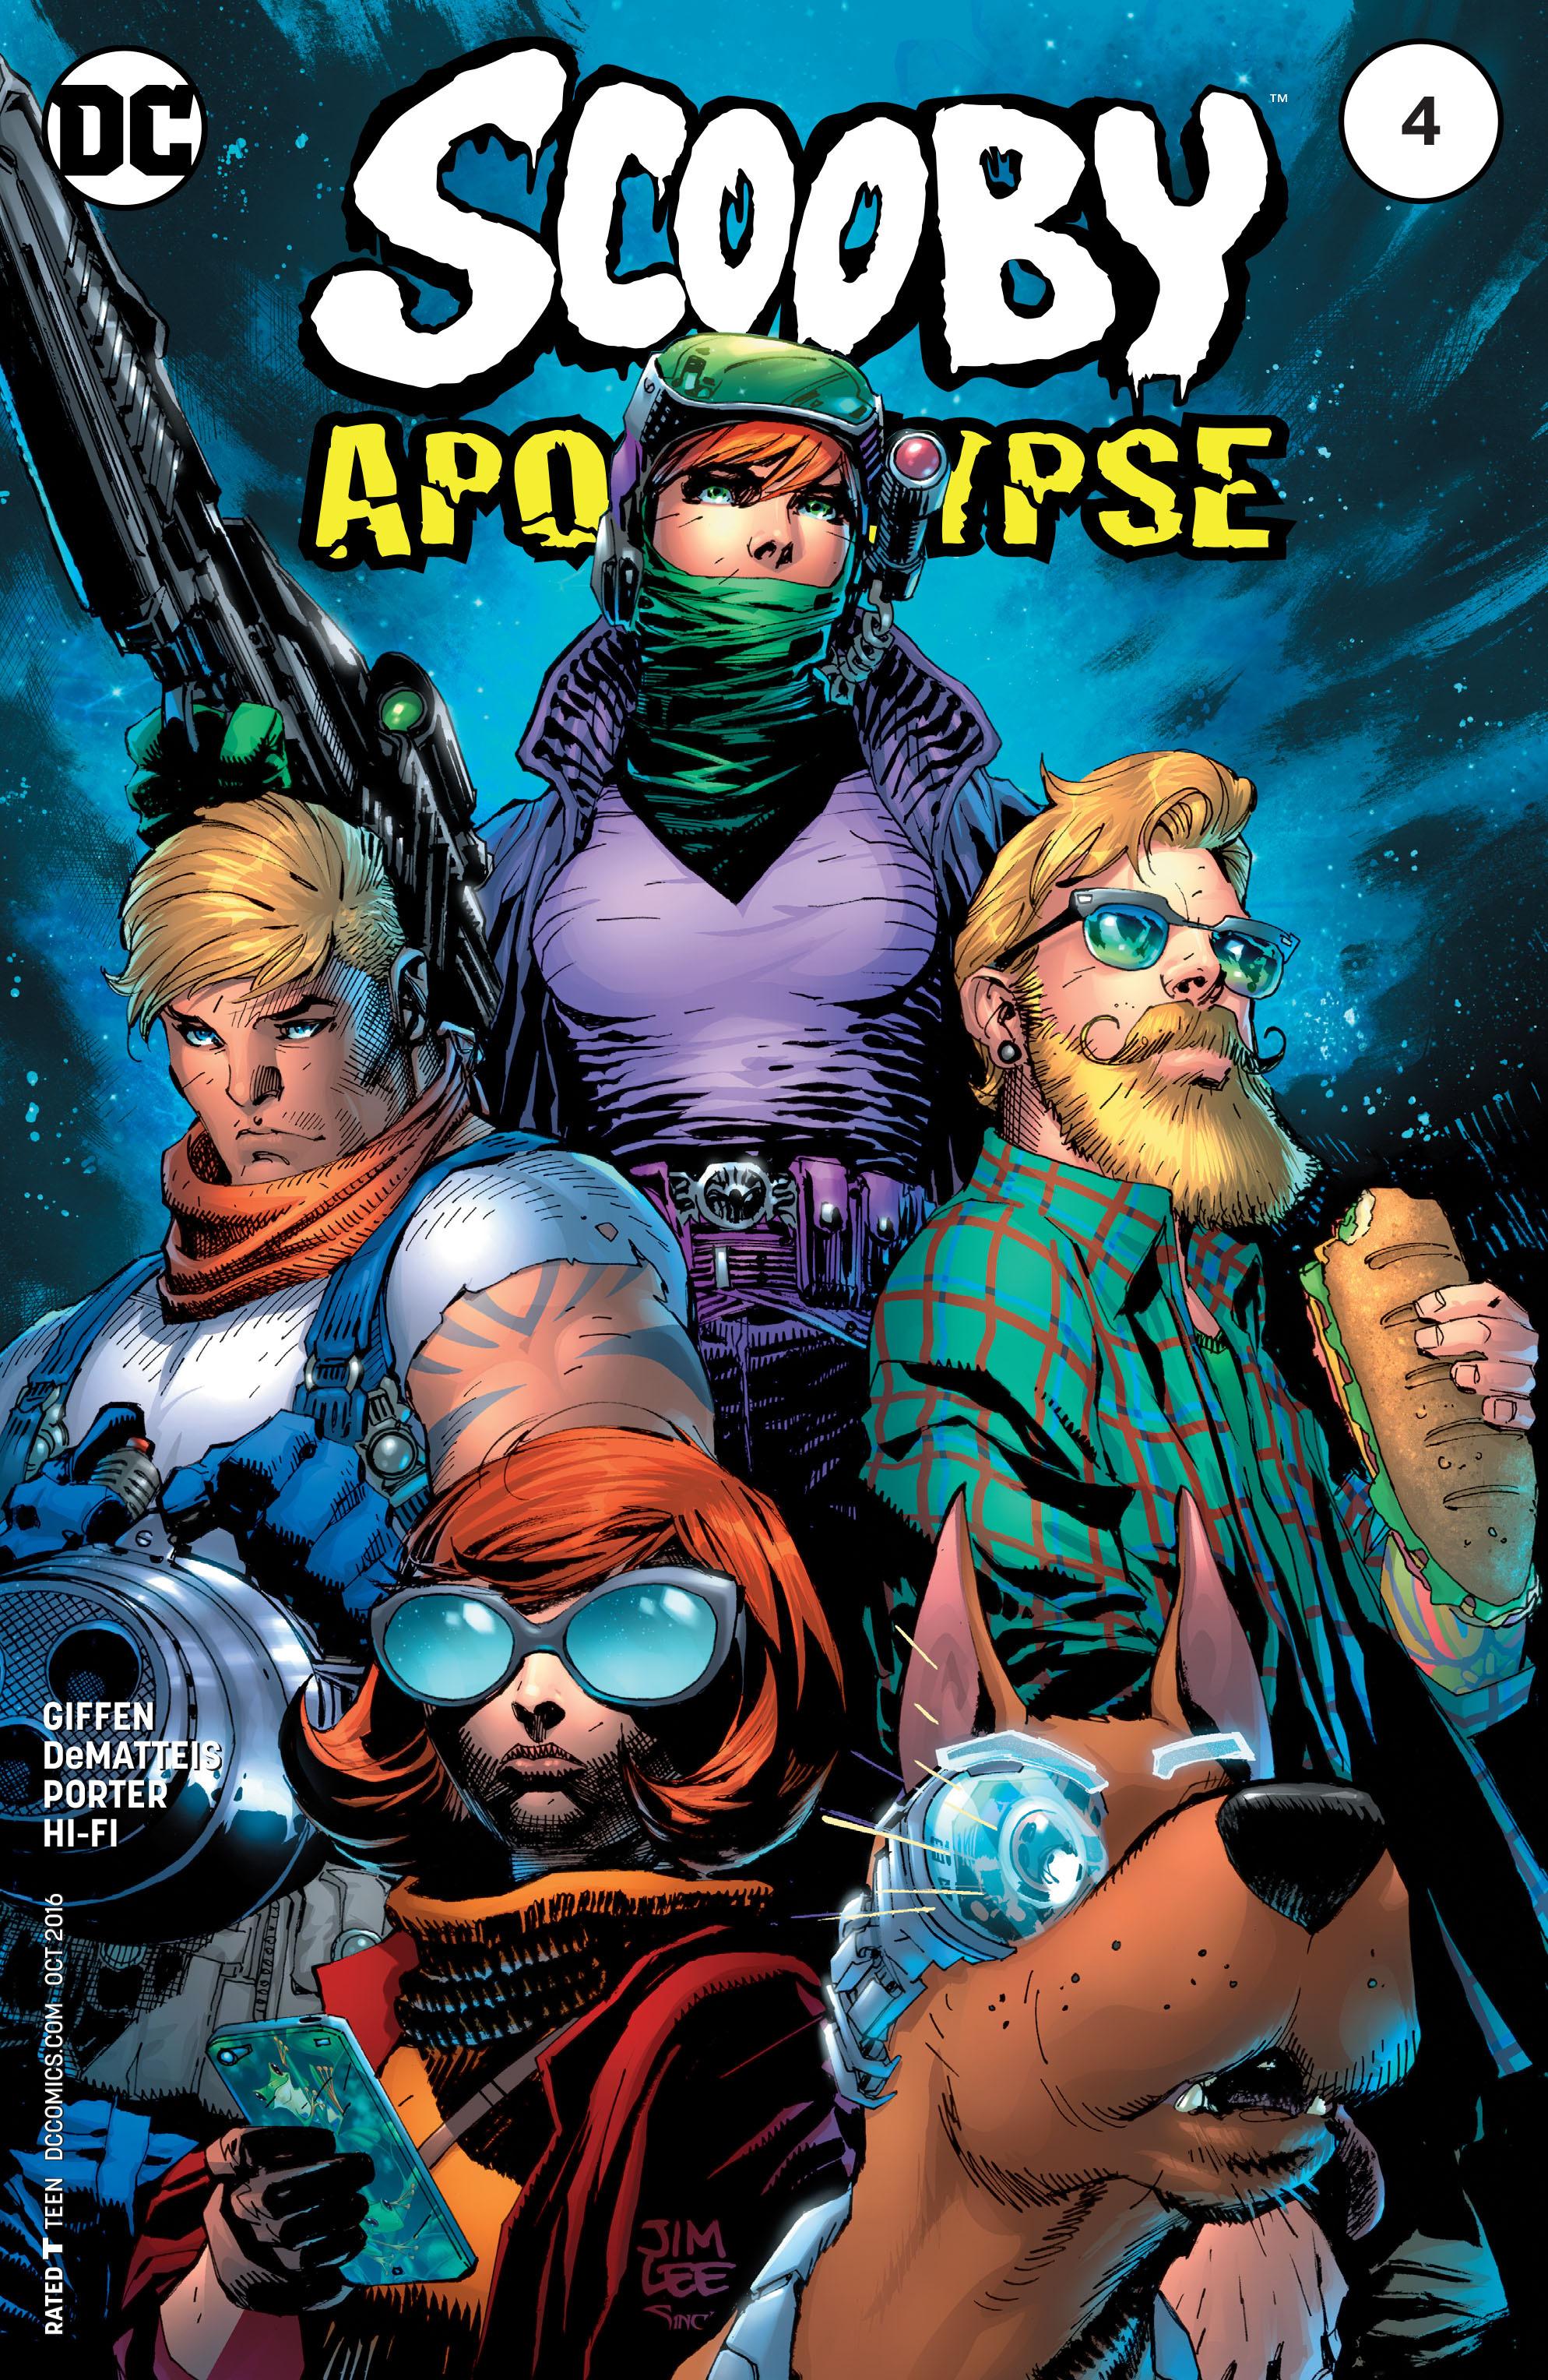 Read online Scooby Apocalypse comic -  Issue #4 - 1